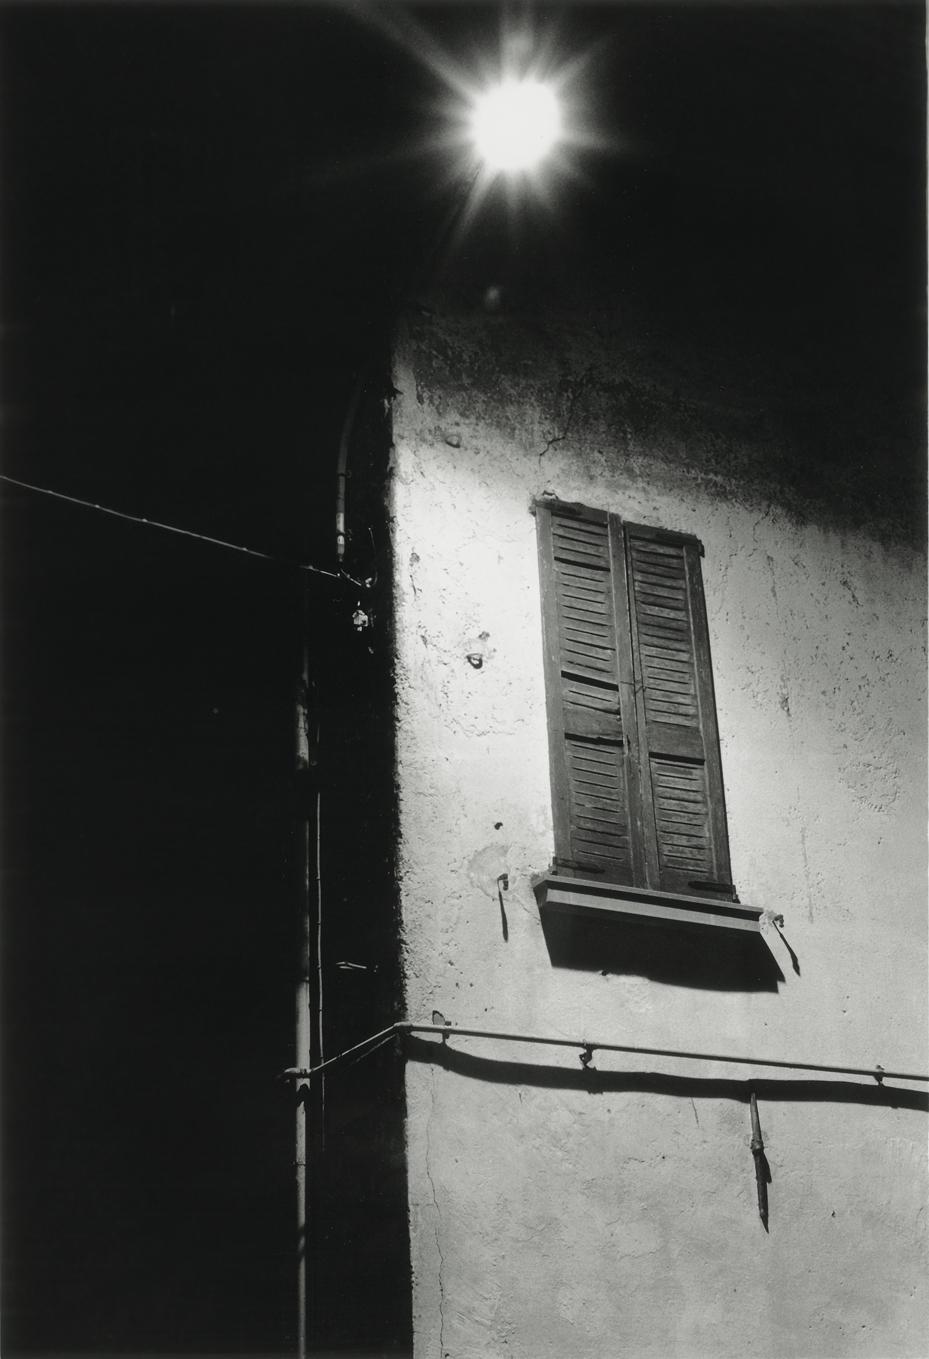 01) Study n. 3 (2011) Paolo Novelli